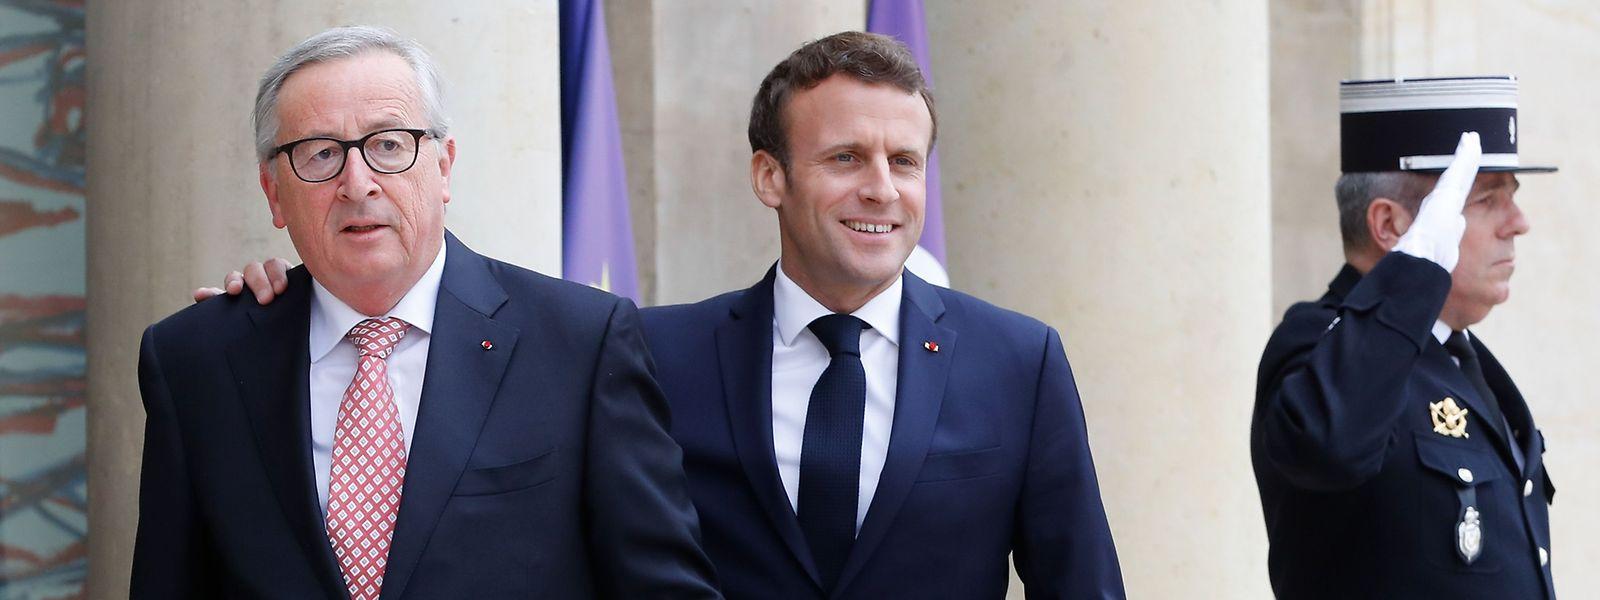 Emmanuel Macron mit Kommissionspräsident Jean-Claude Juncker